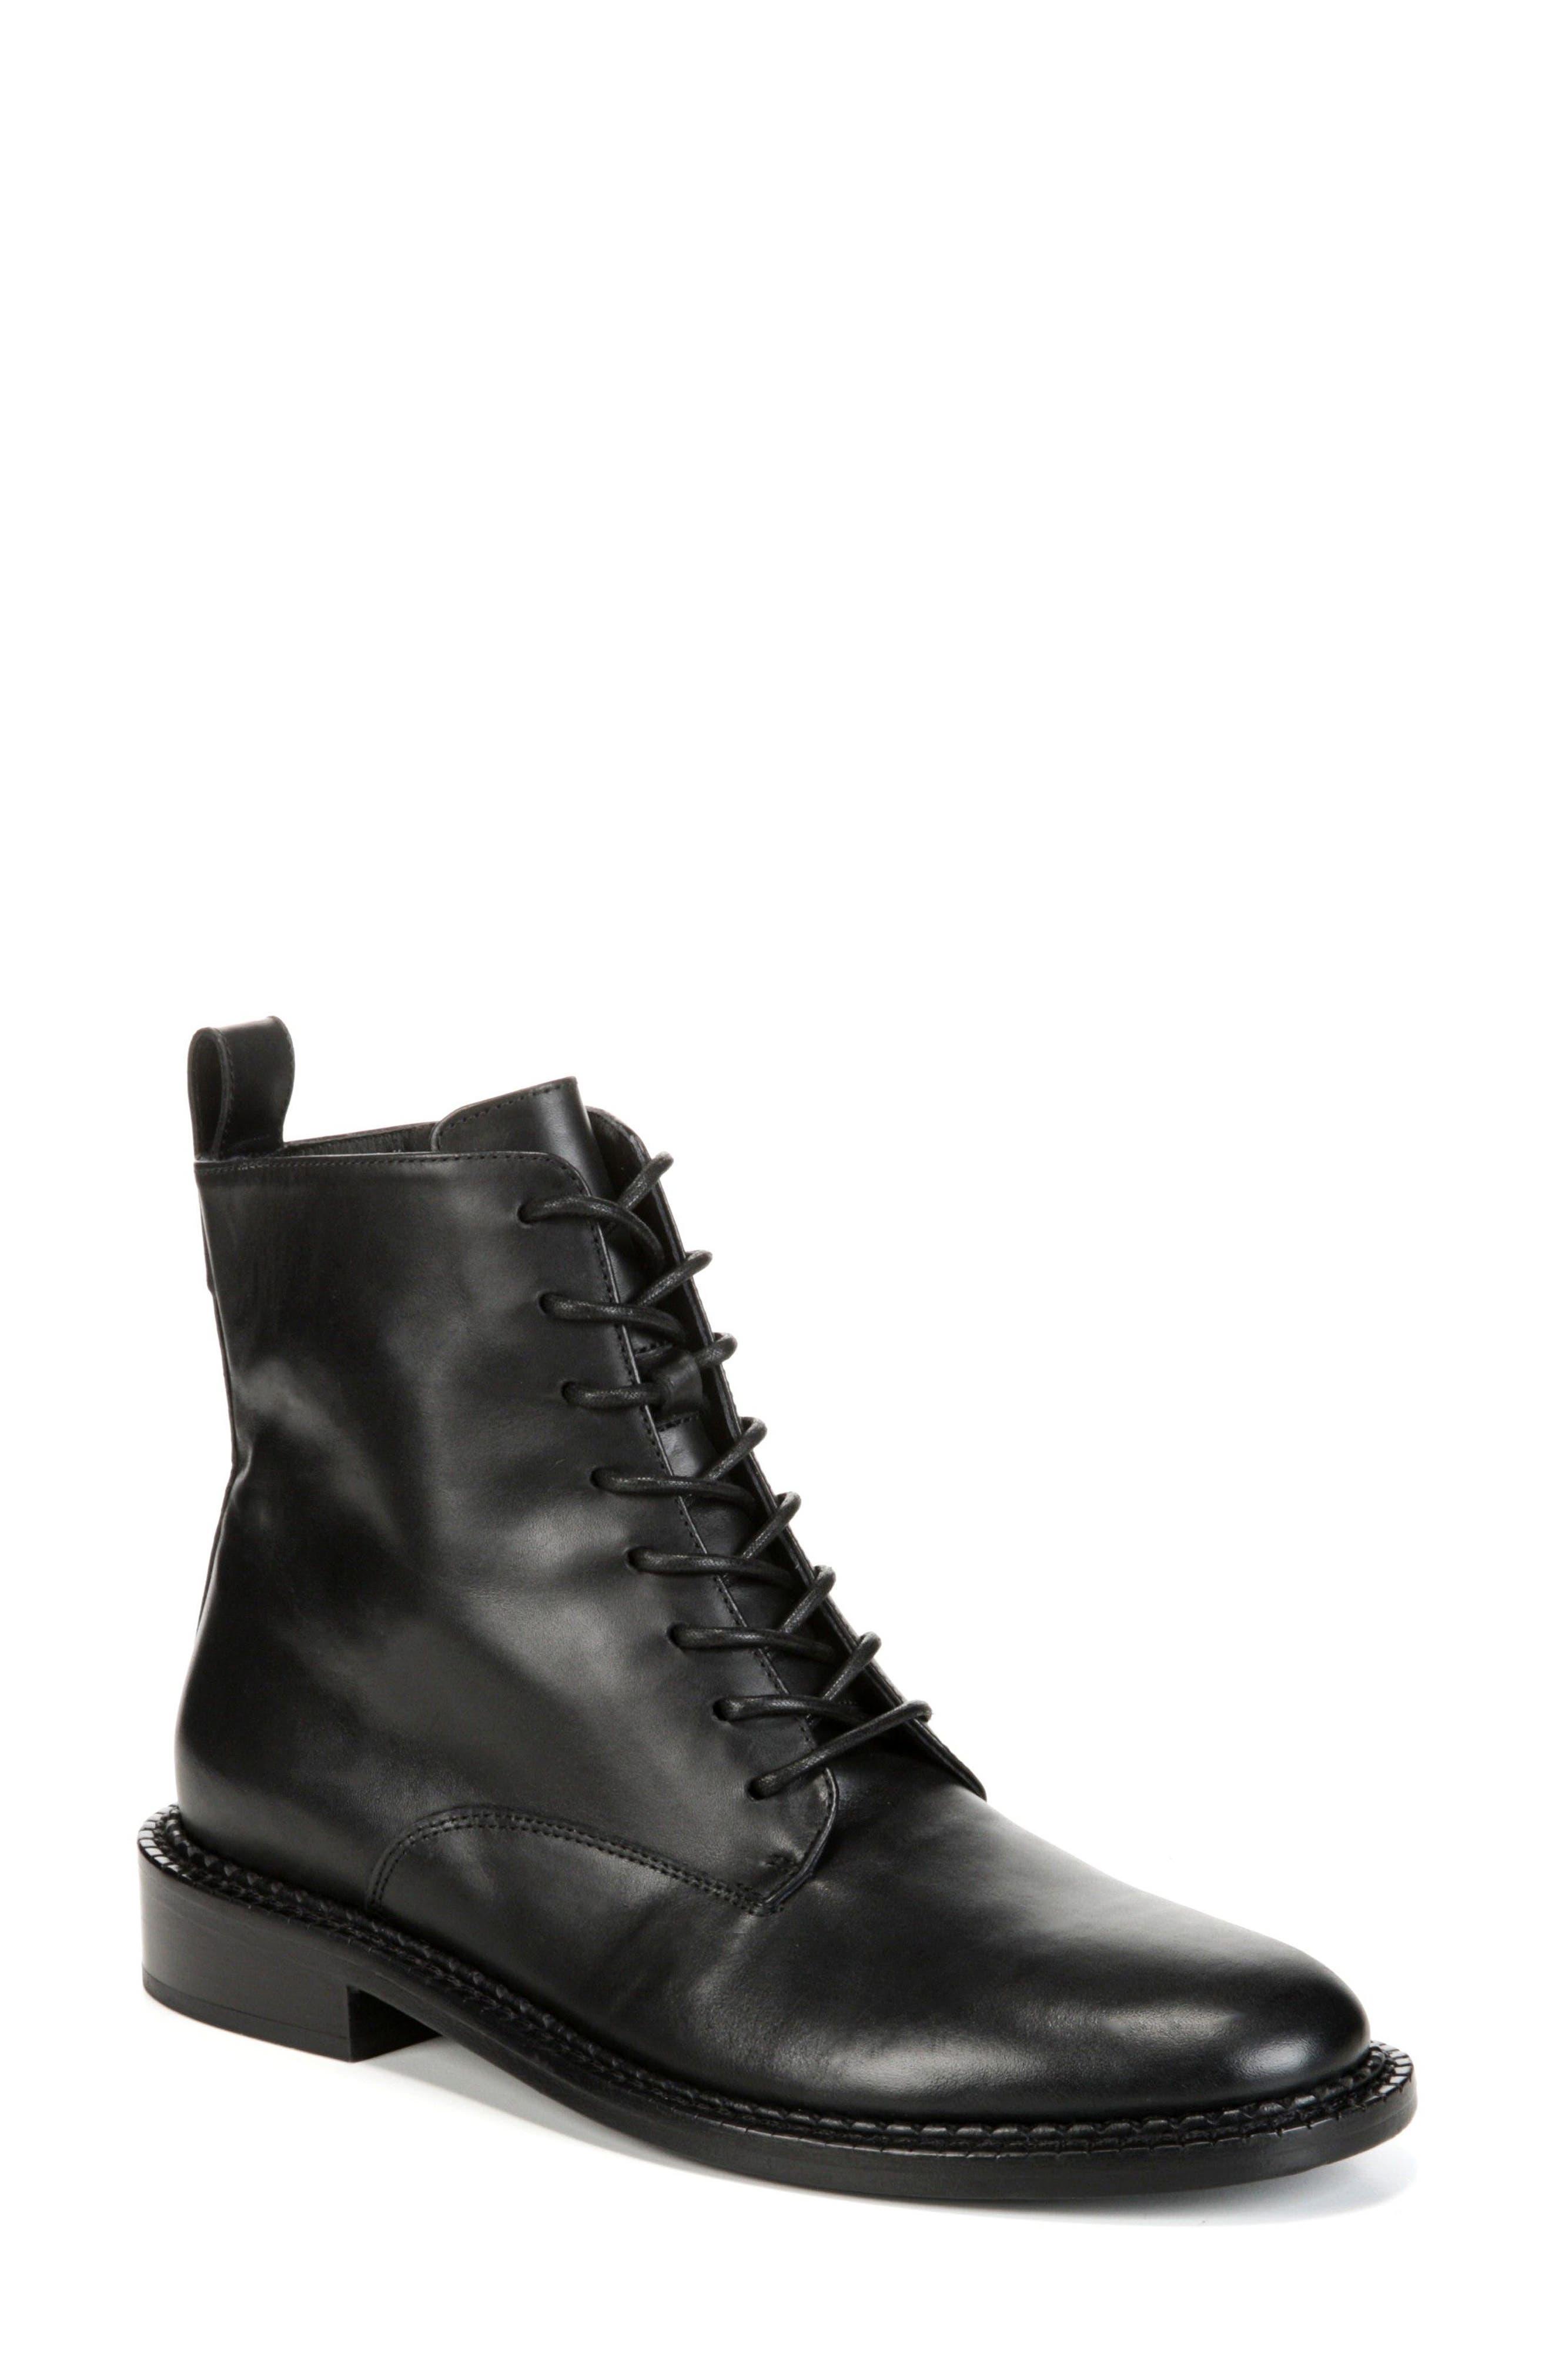 VINCE, Cabria Lace-Up Boot, Main thumbnail 1, color, BLACK